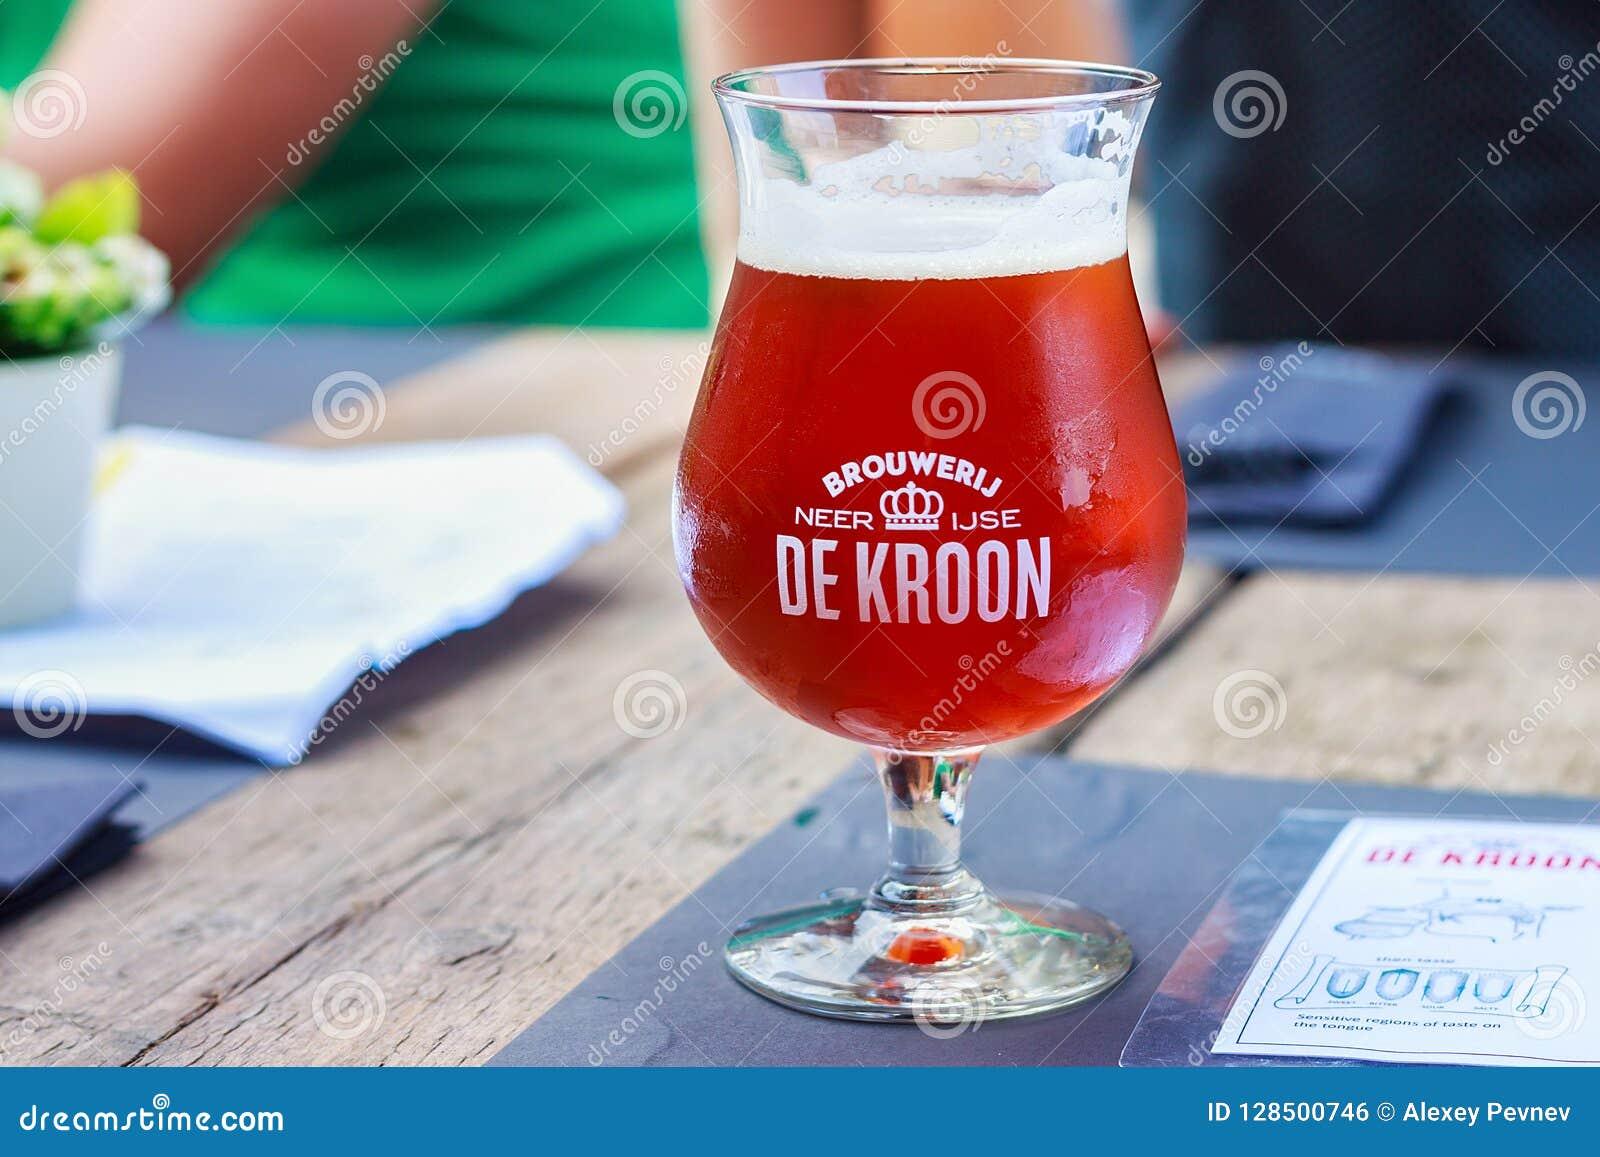 NEERIJSE, BELGIUM - SEPTEMBER 05, 2014: Tasting original beer of the De Kroon brand in same name restaurant.